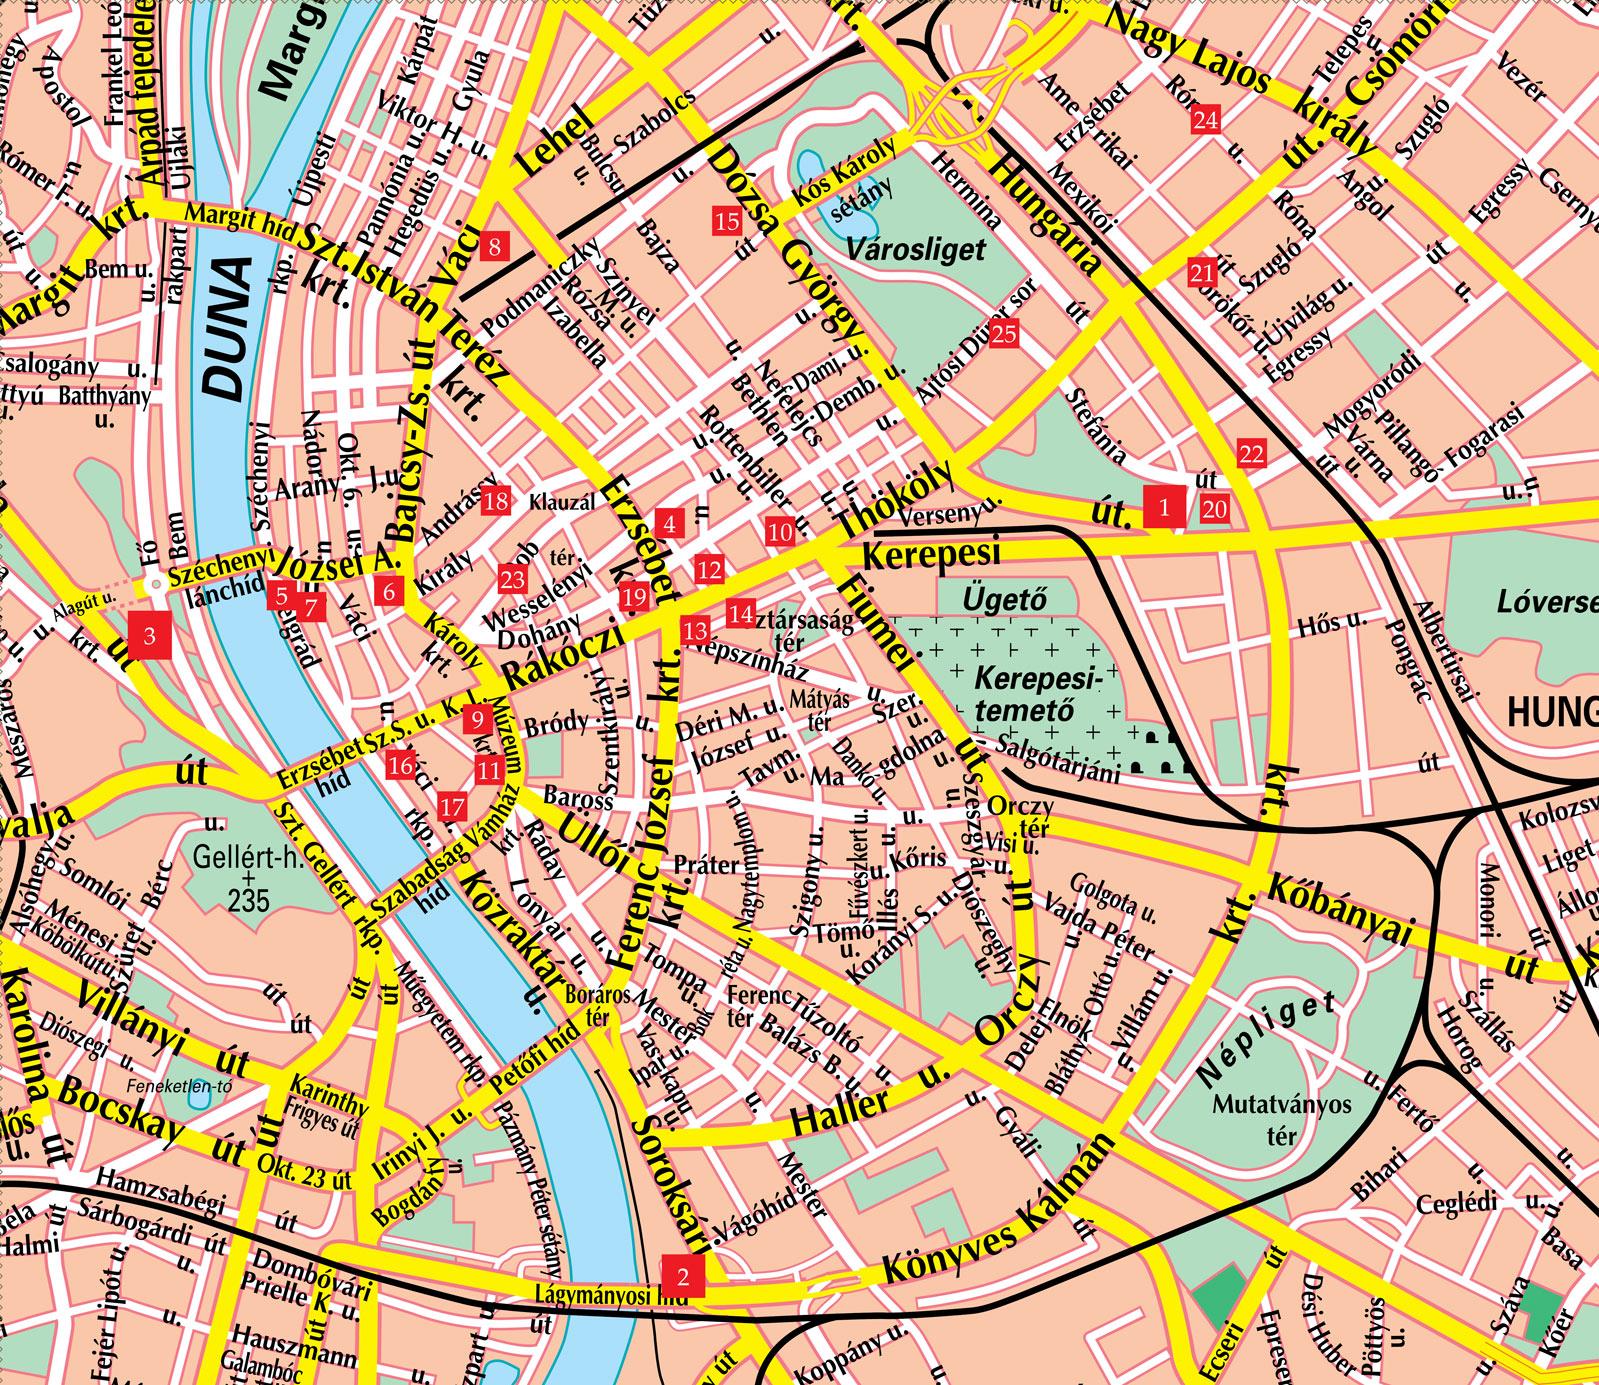 Budapest Street Map Budapest Hungary mappery – Budapest Tourist Map